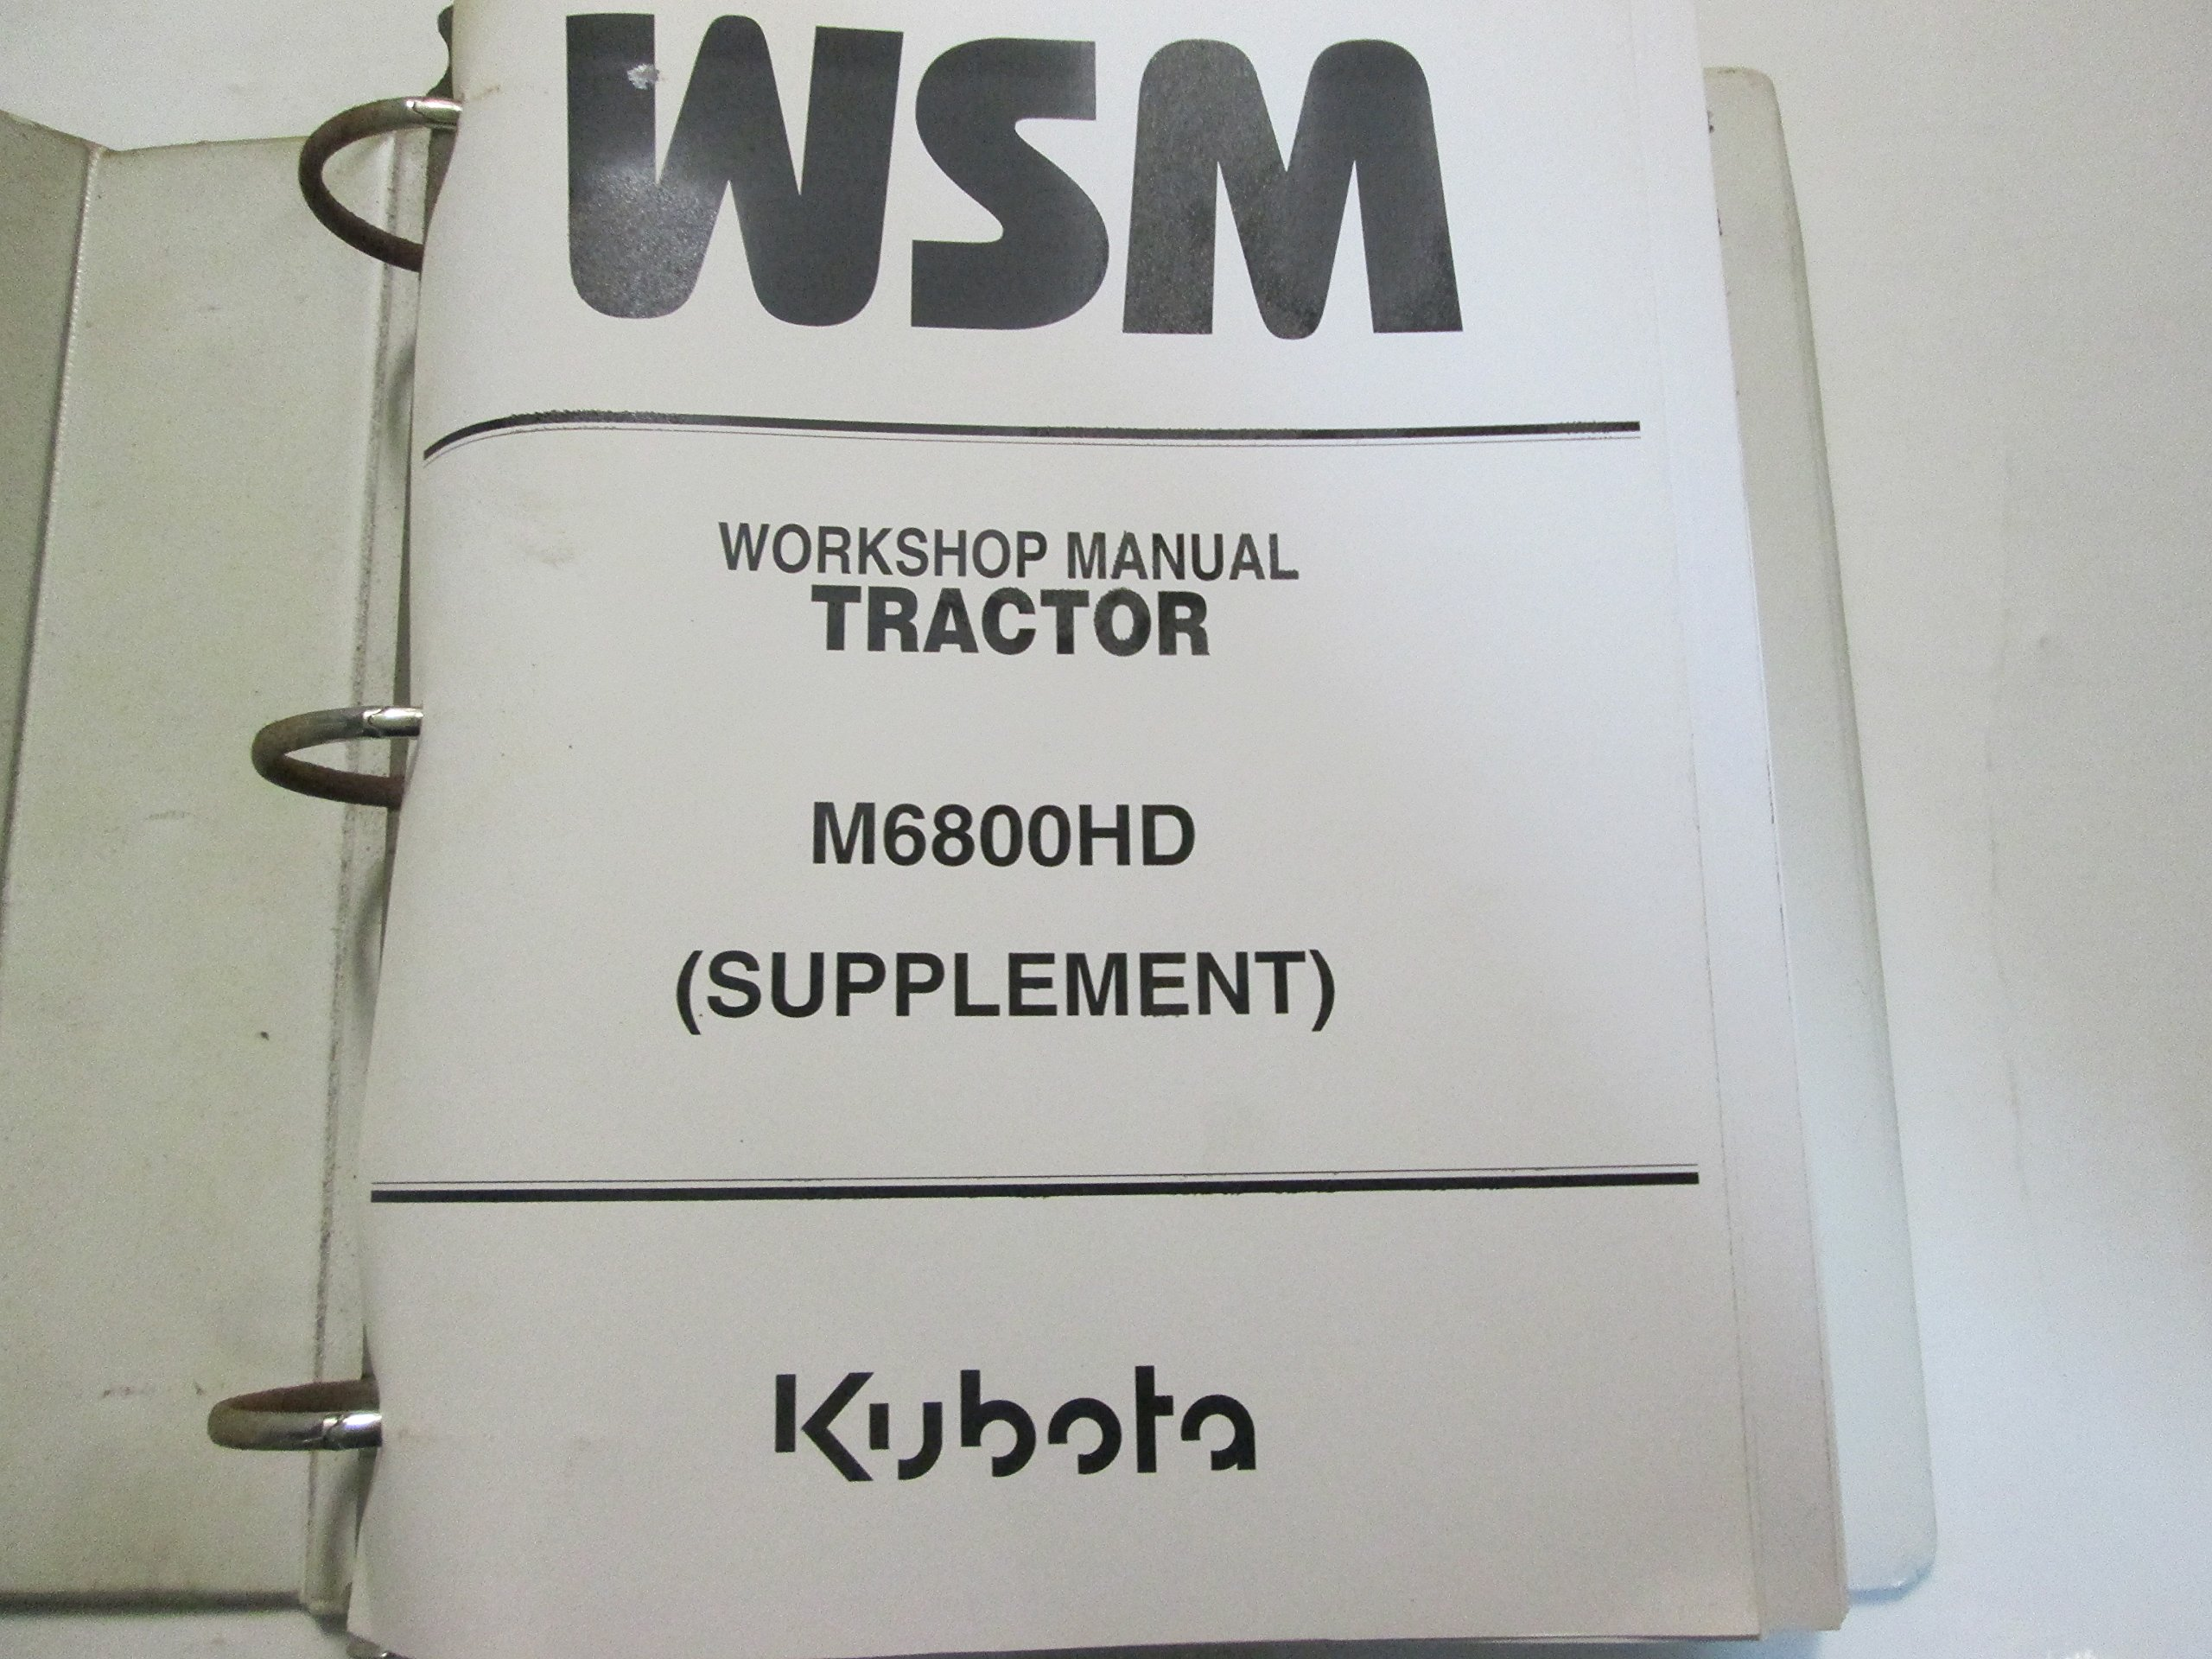 Kubota Tractor M6800HD Service Repair Shop Manual Supplement Factory OEM  Book: Kubota: Amazon.com: Books